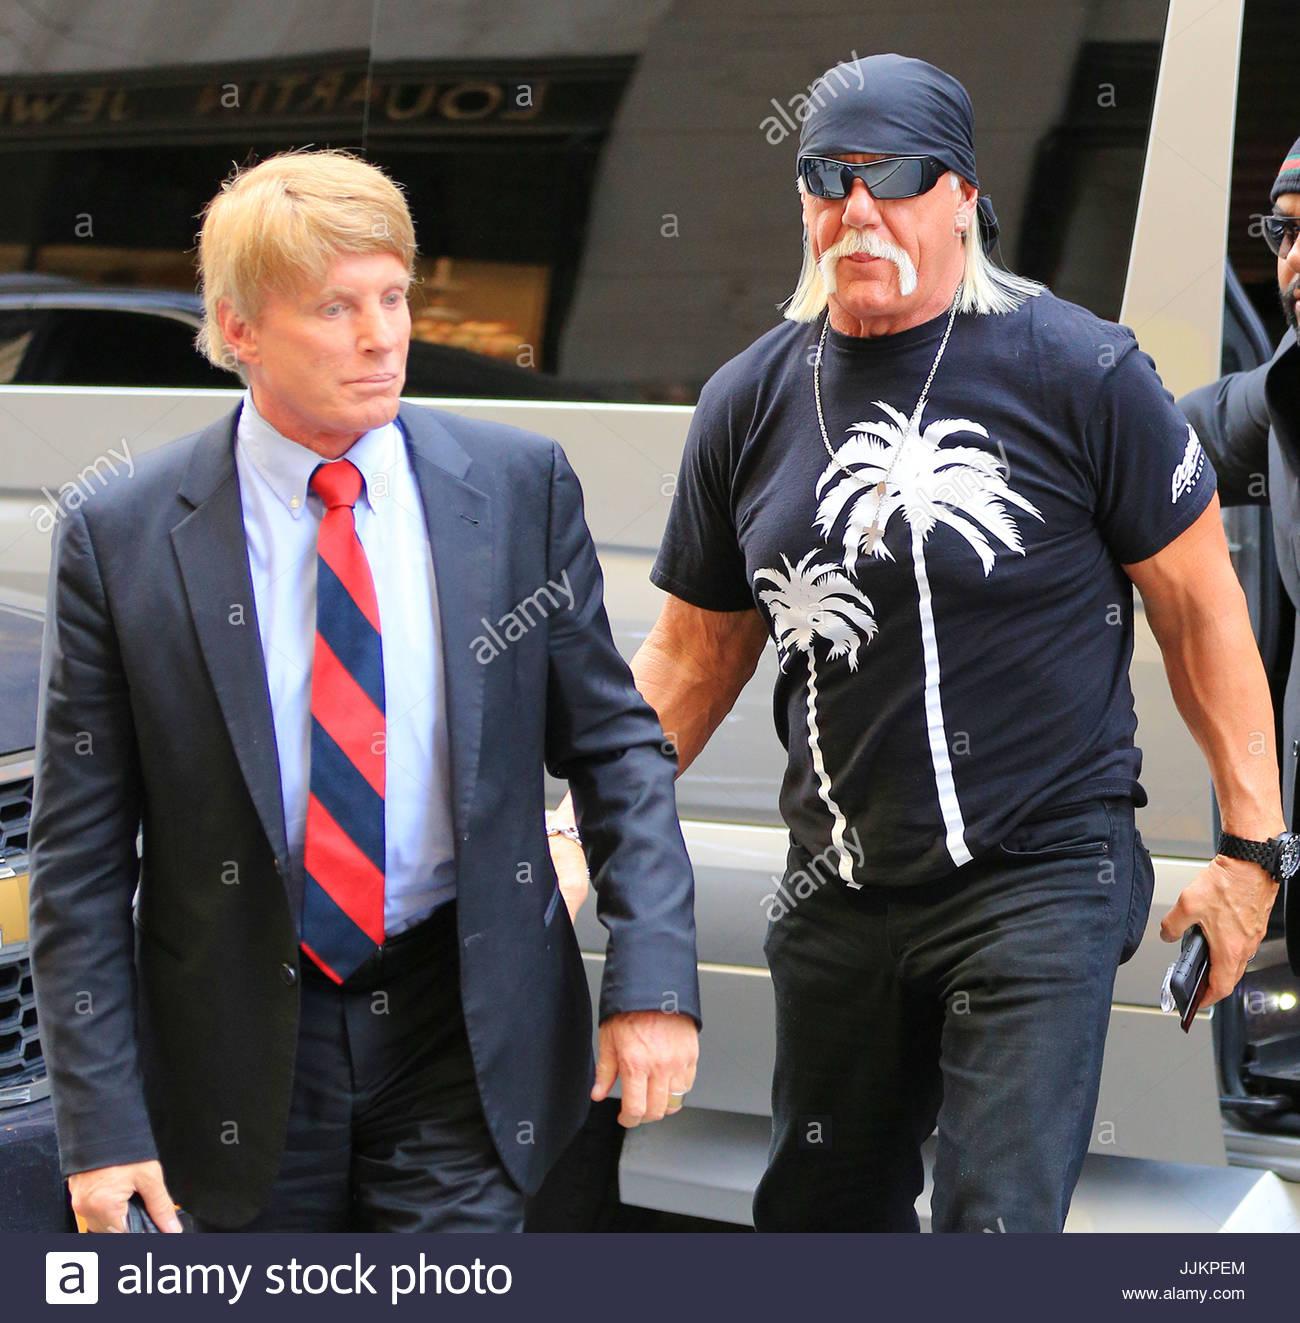 Hulk hogan terry-8843